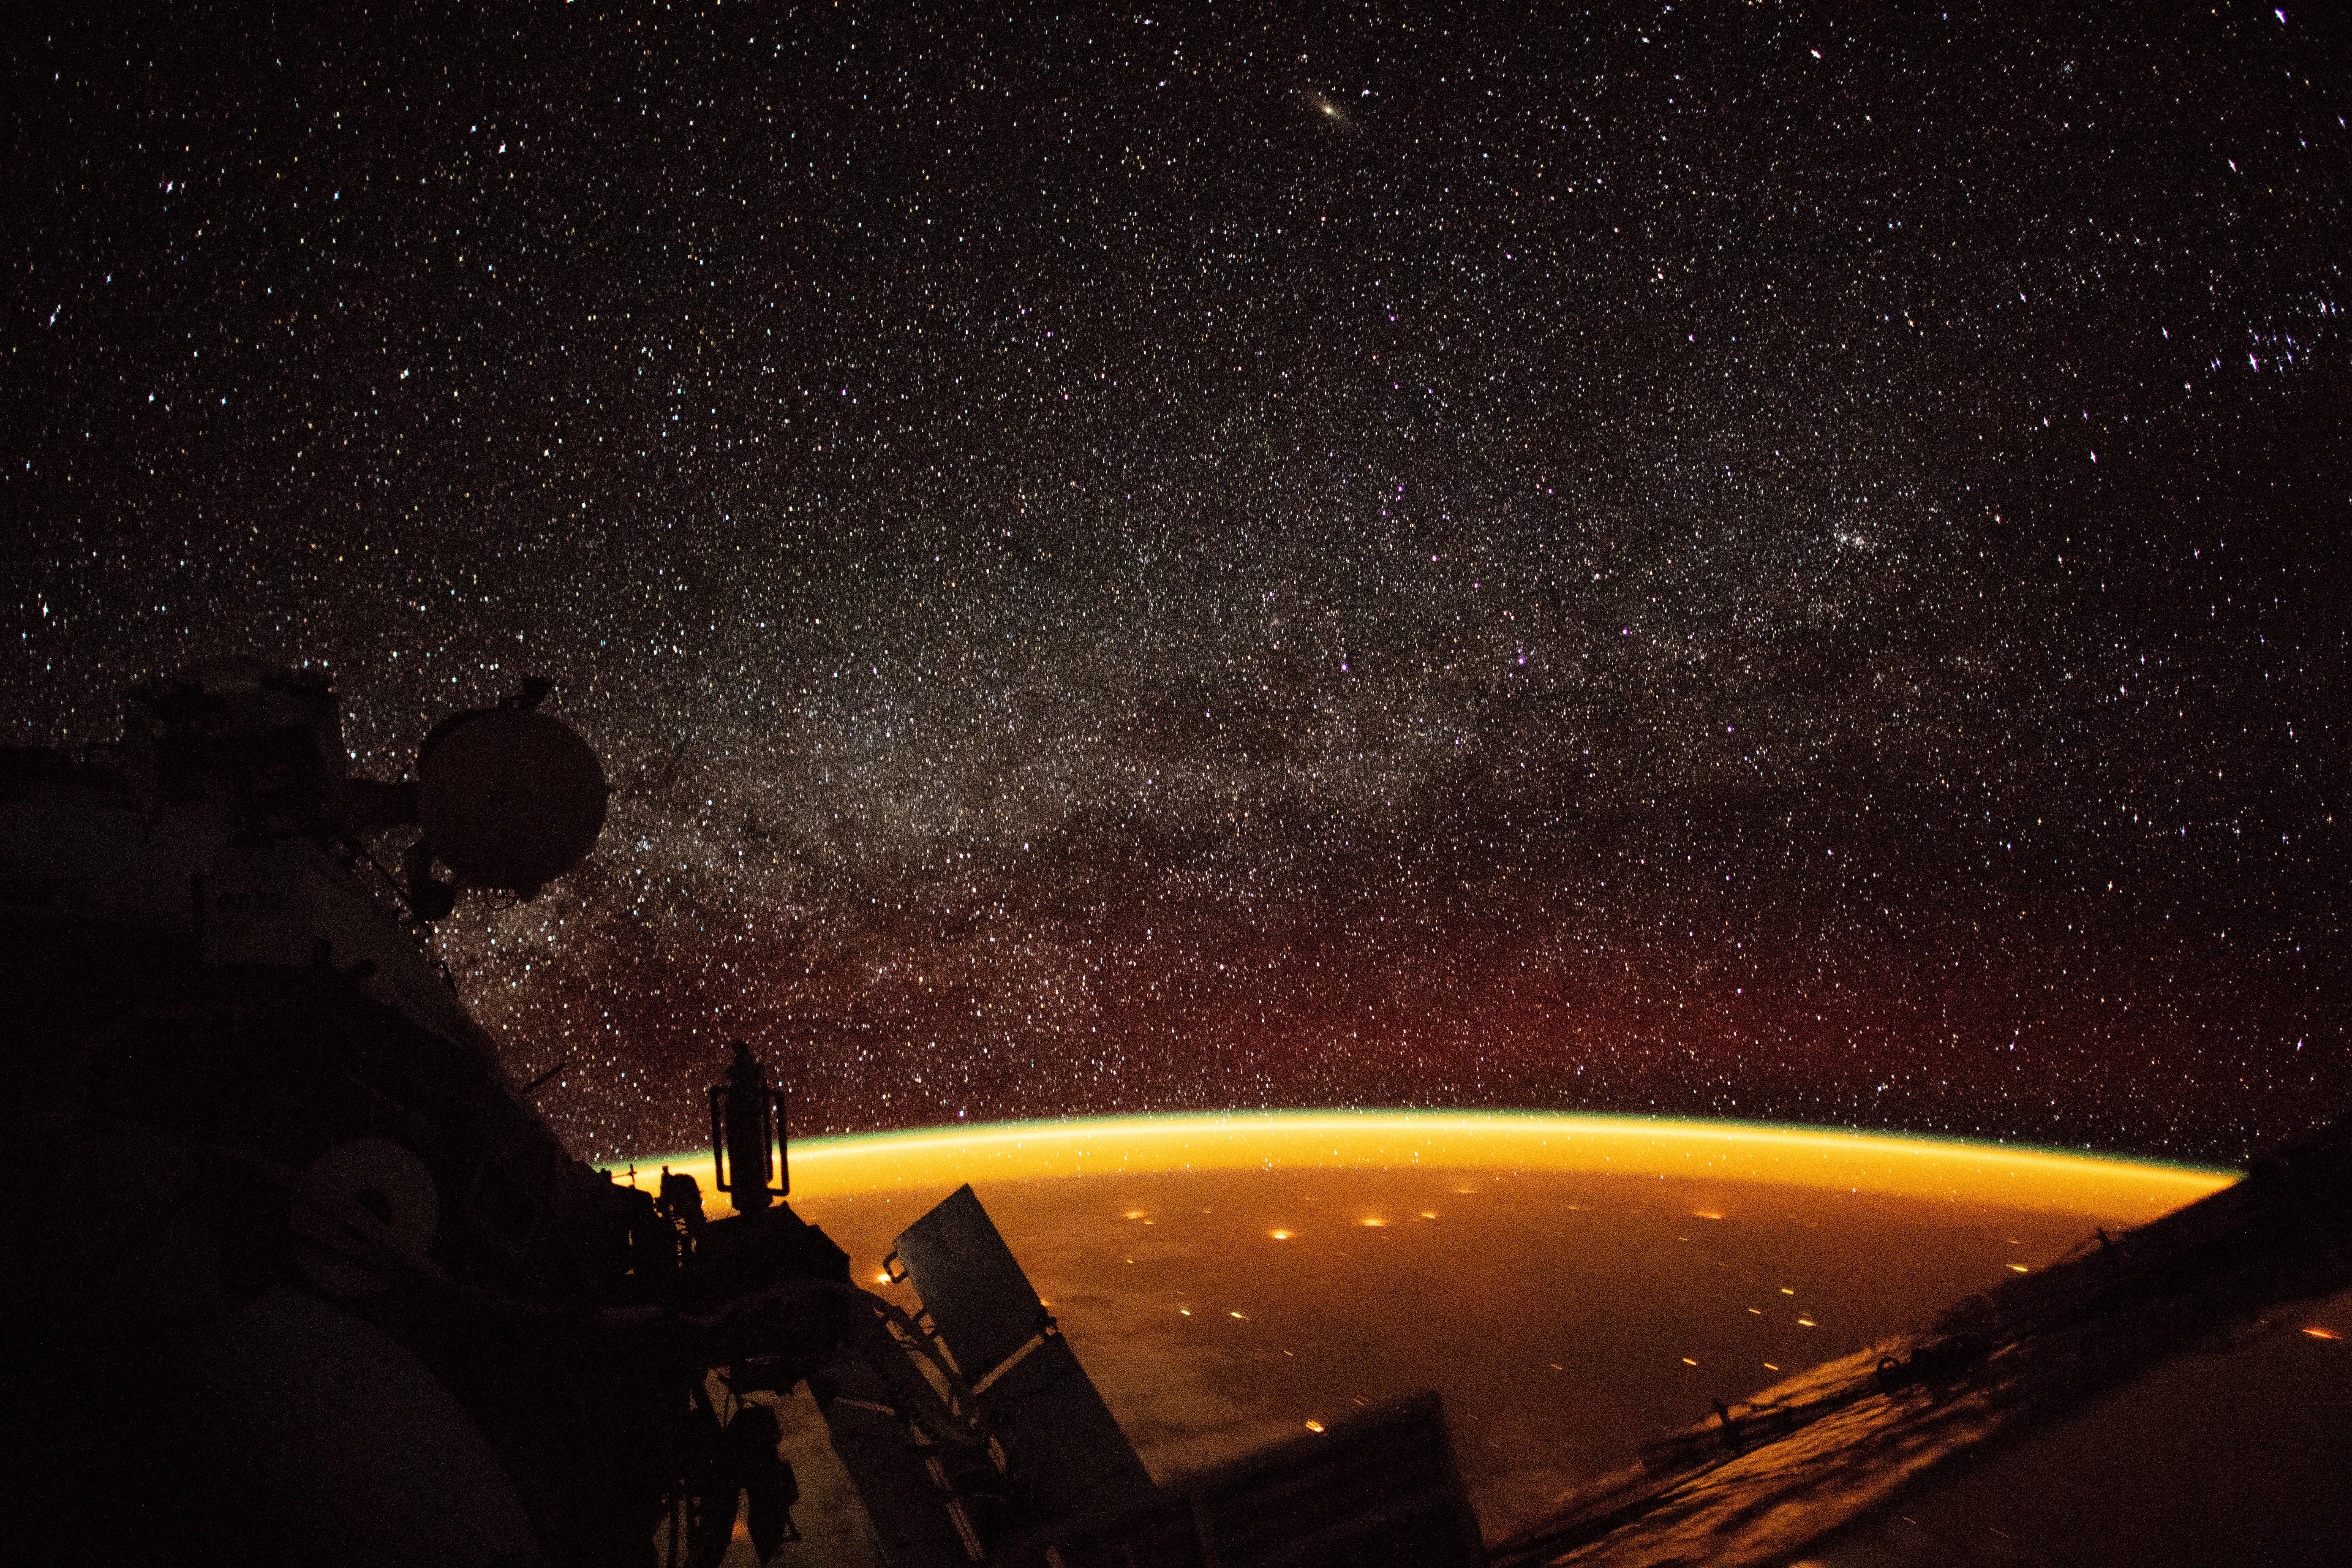 Earth Enveloped in Airglow